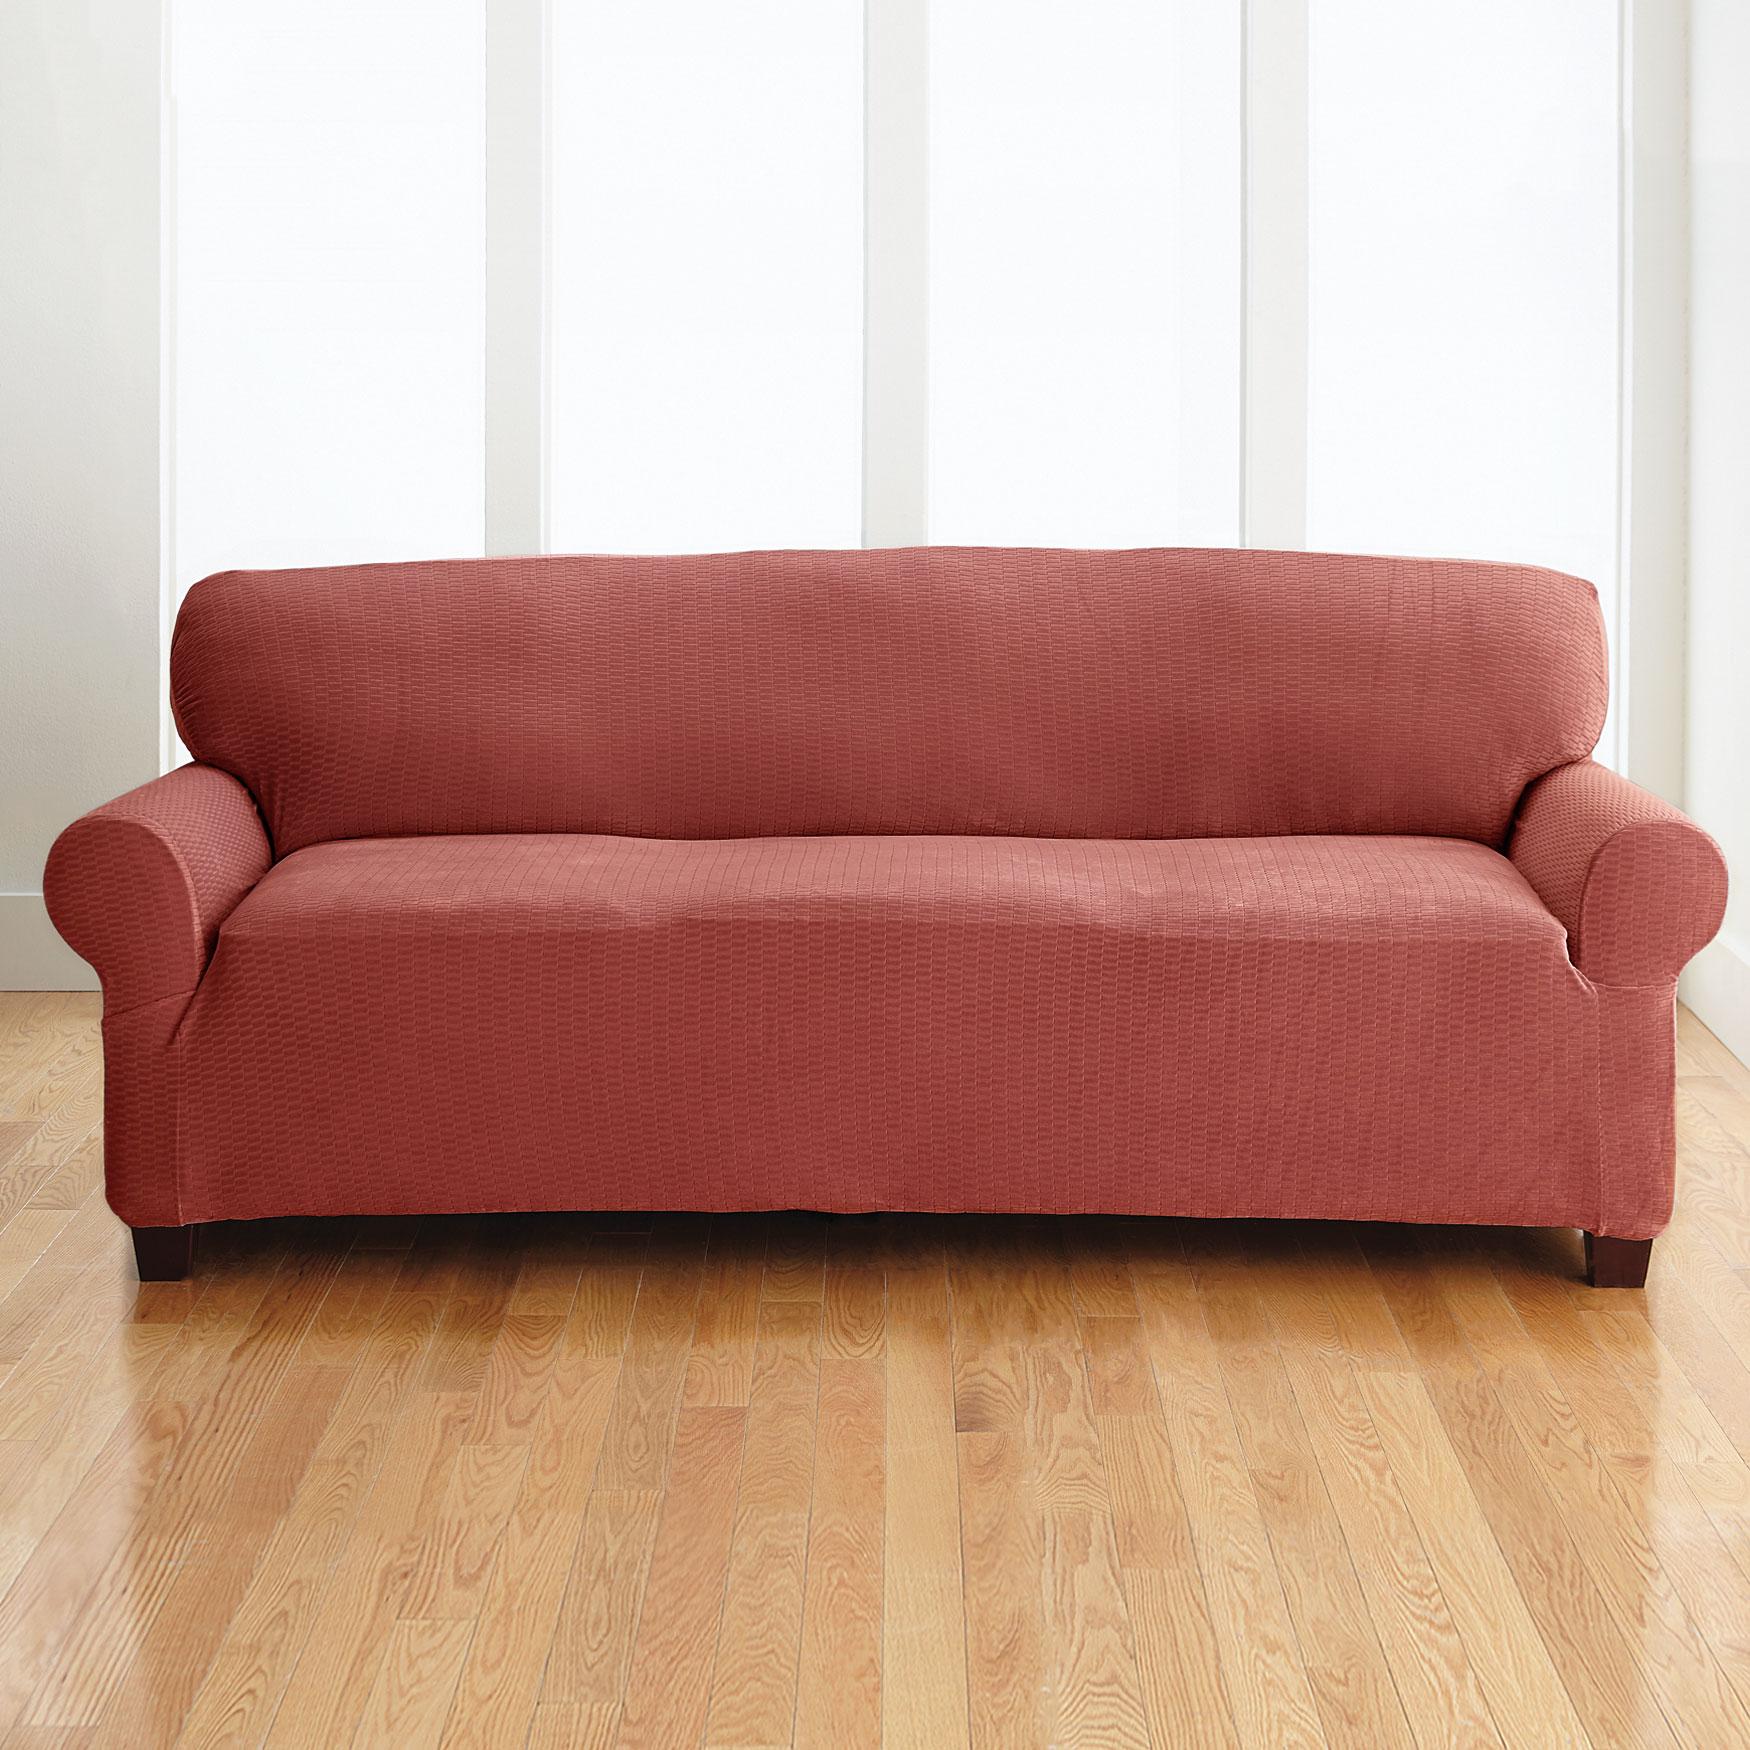 extra long sofa slipcover kenton sectional bh studio brighton plus size